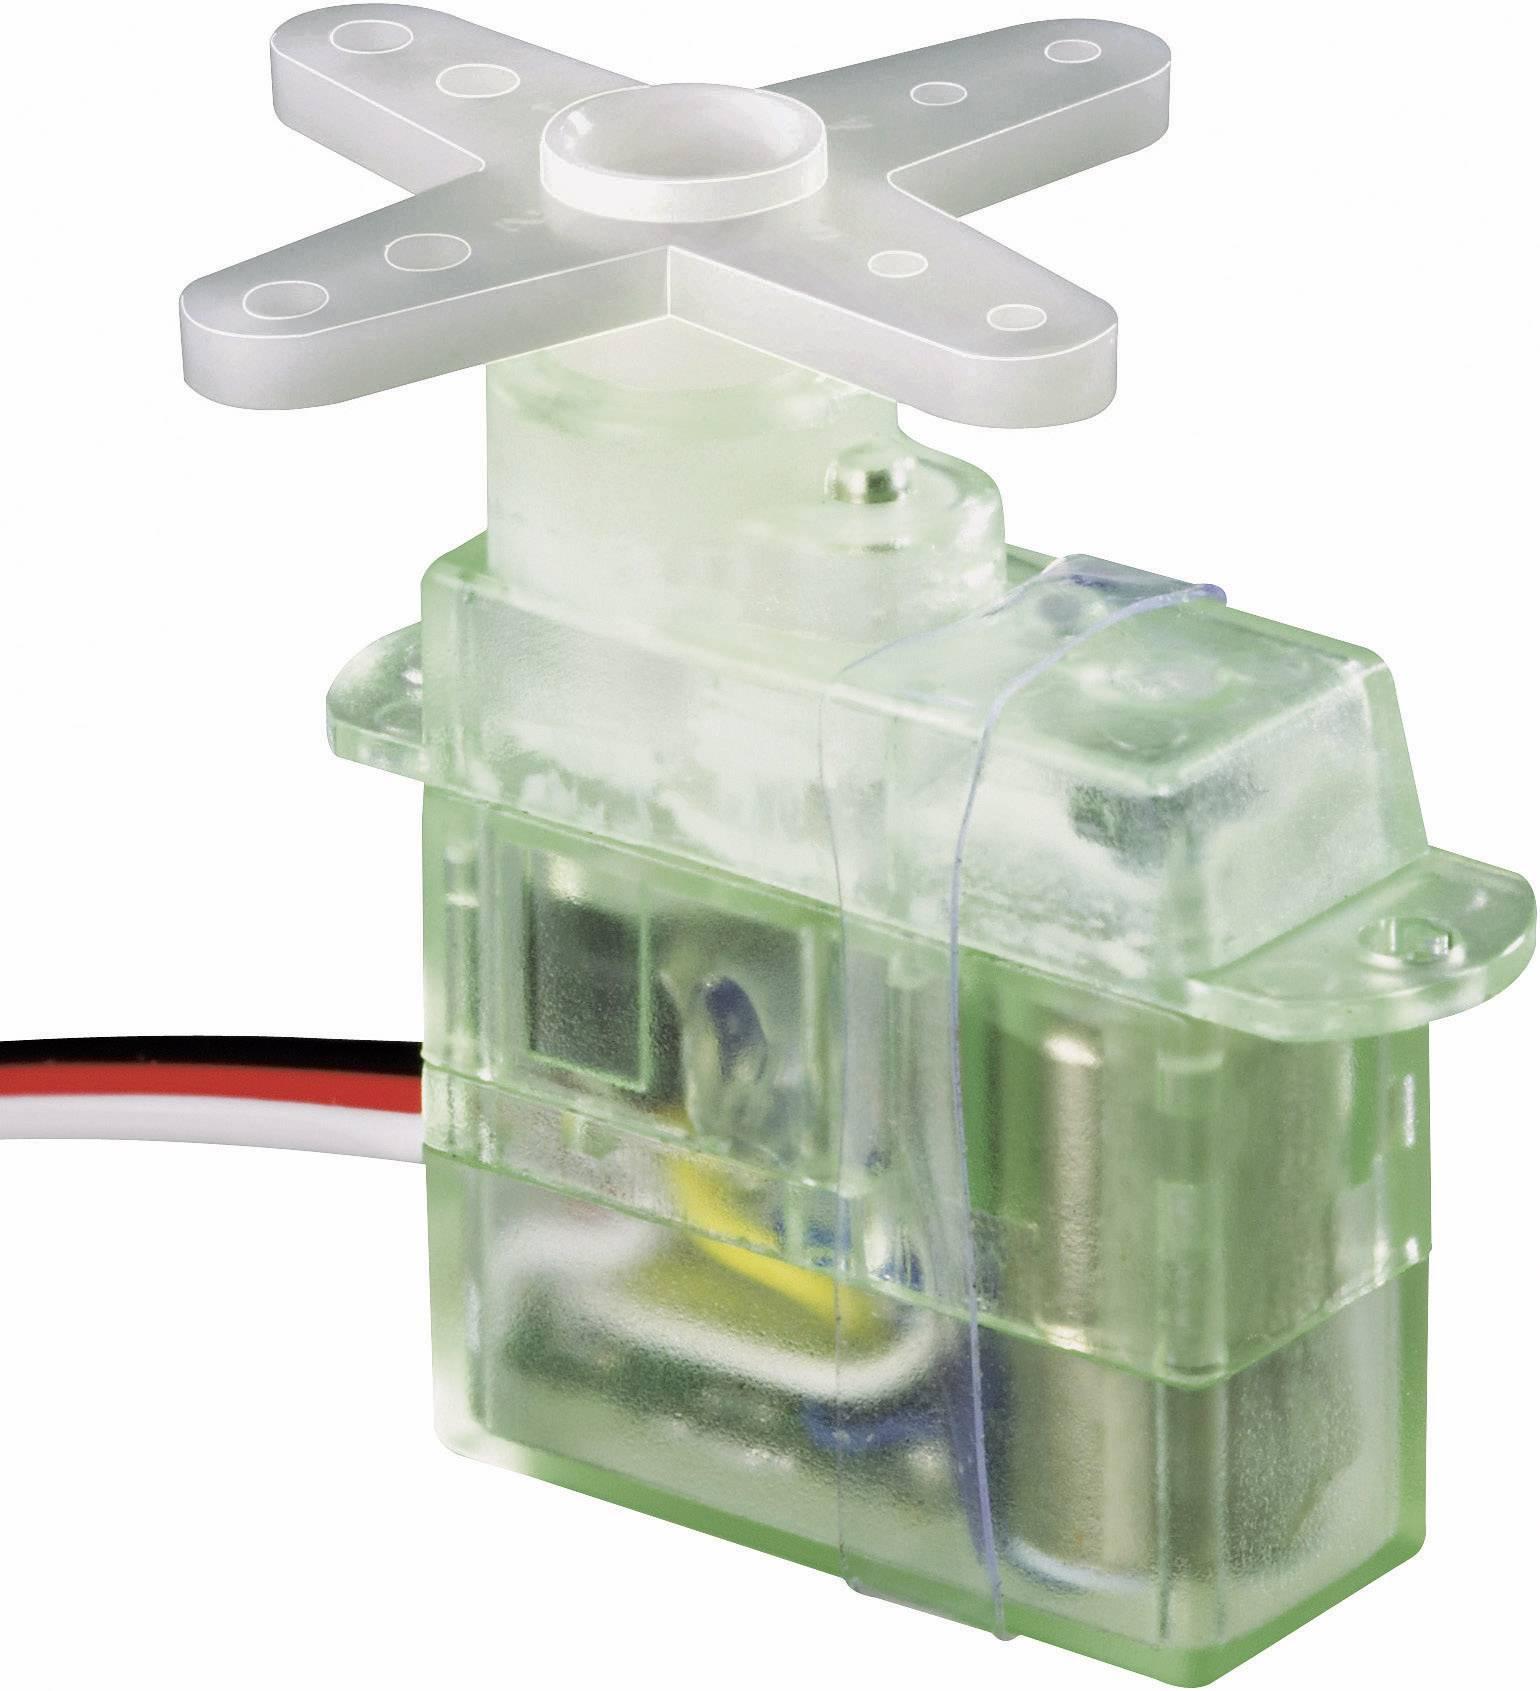 Micro servo Modelcraft ES-07